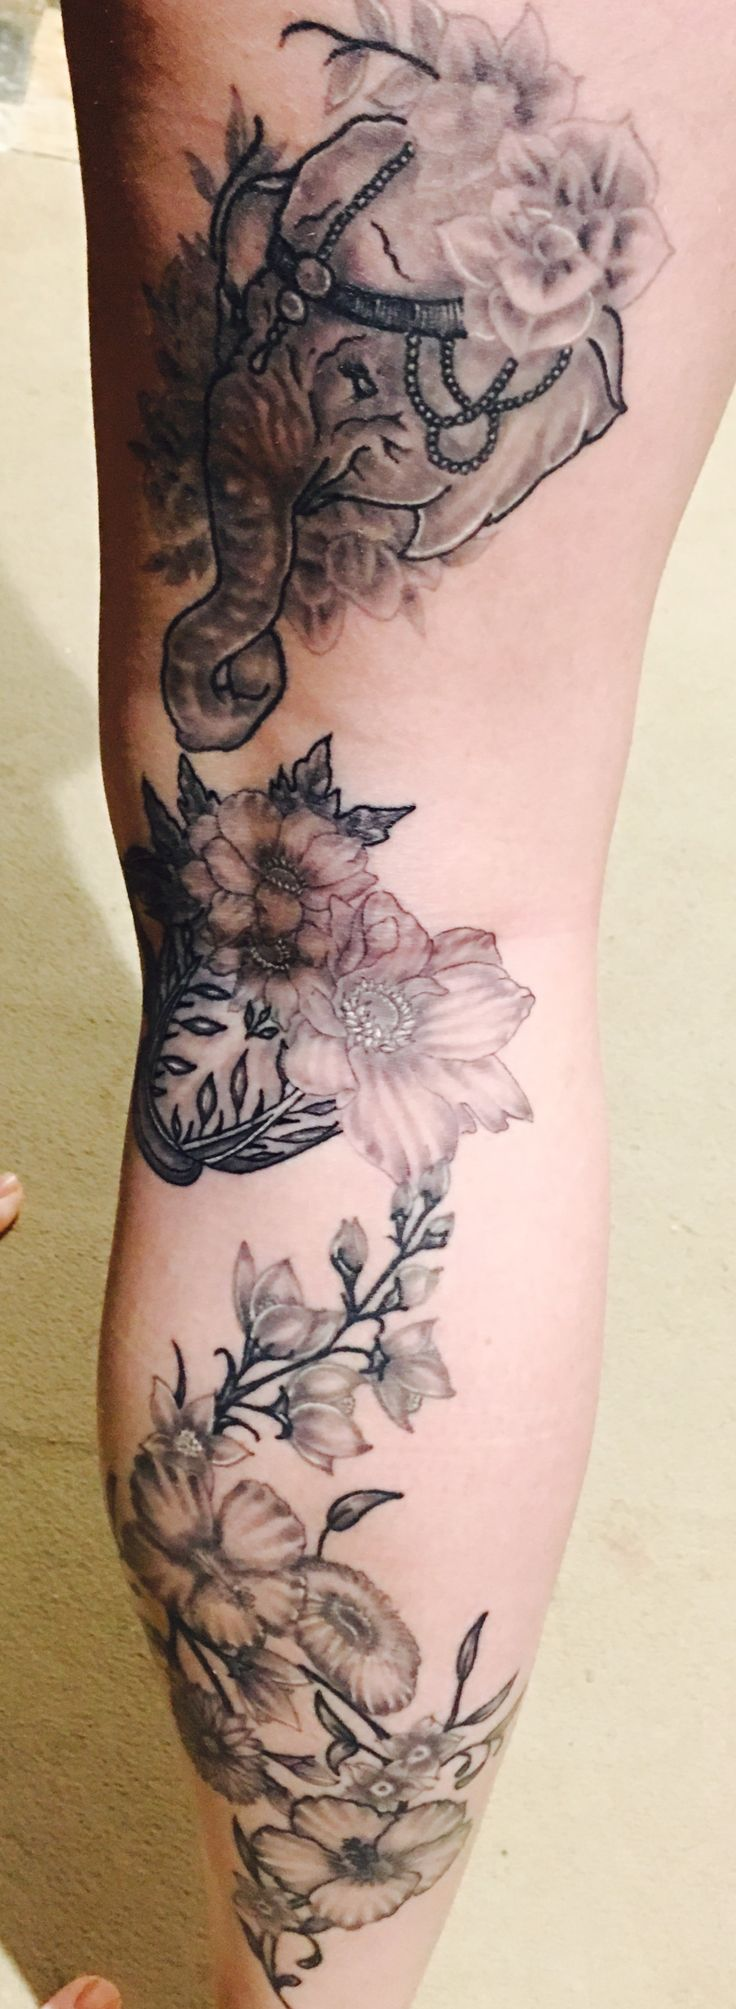 Flower thigh tattoos women fashion and lifestyles - Girl Leg Tattoo In Progress Black And White Flowers Elephant Tattoo